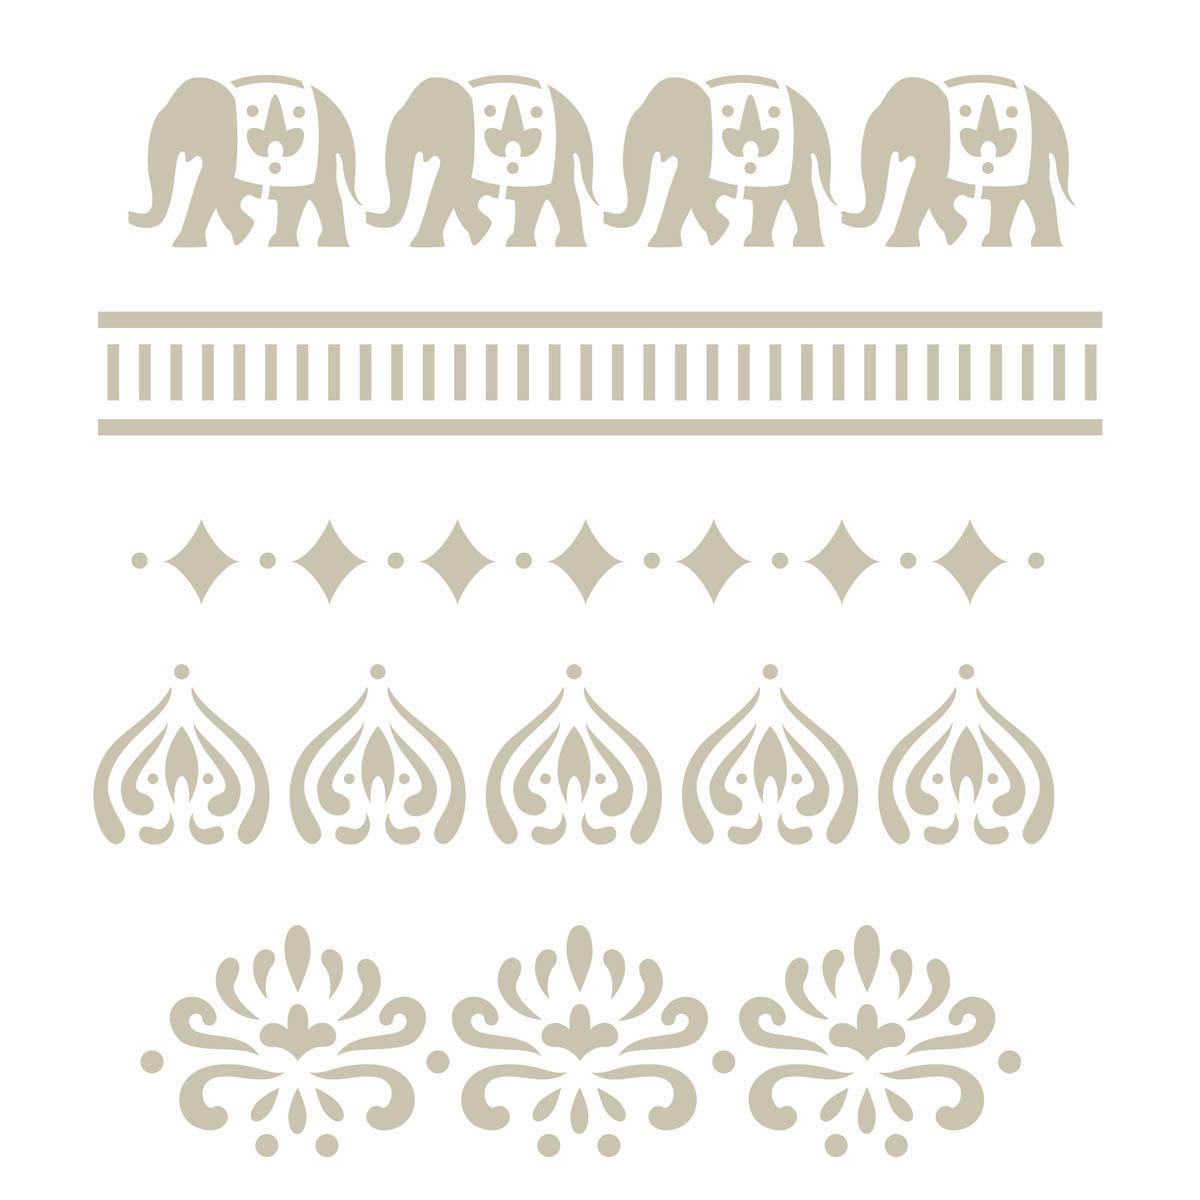 FolkArt ® Handmade Charlotte™ Stencils - Alibaba - 30946